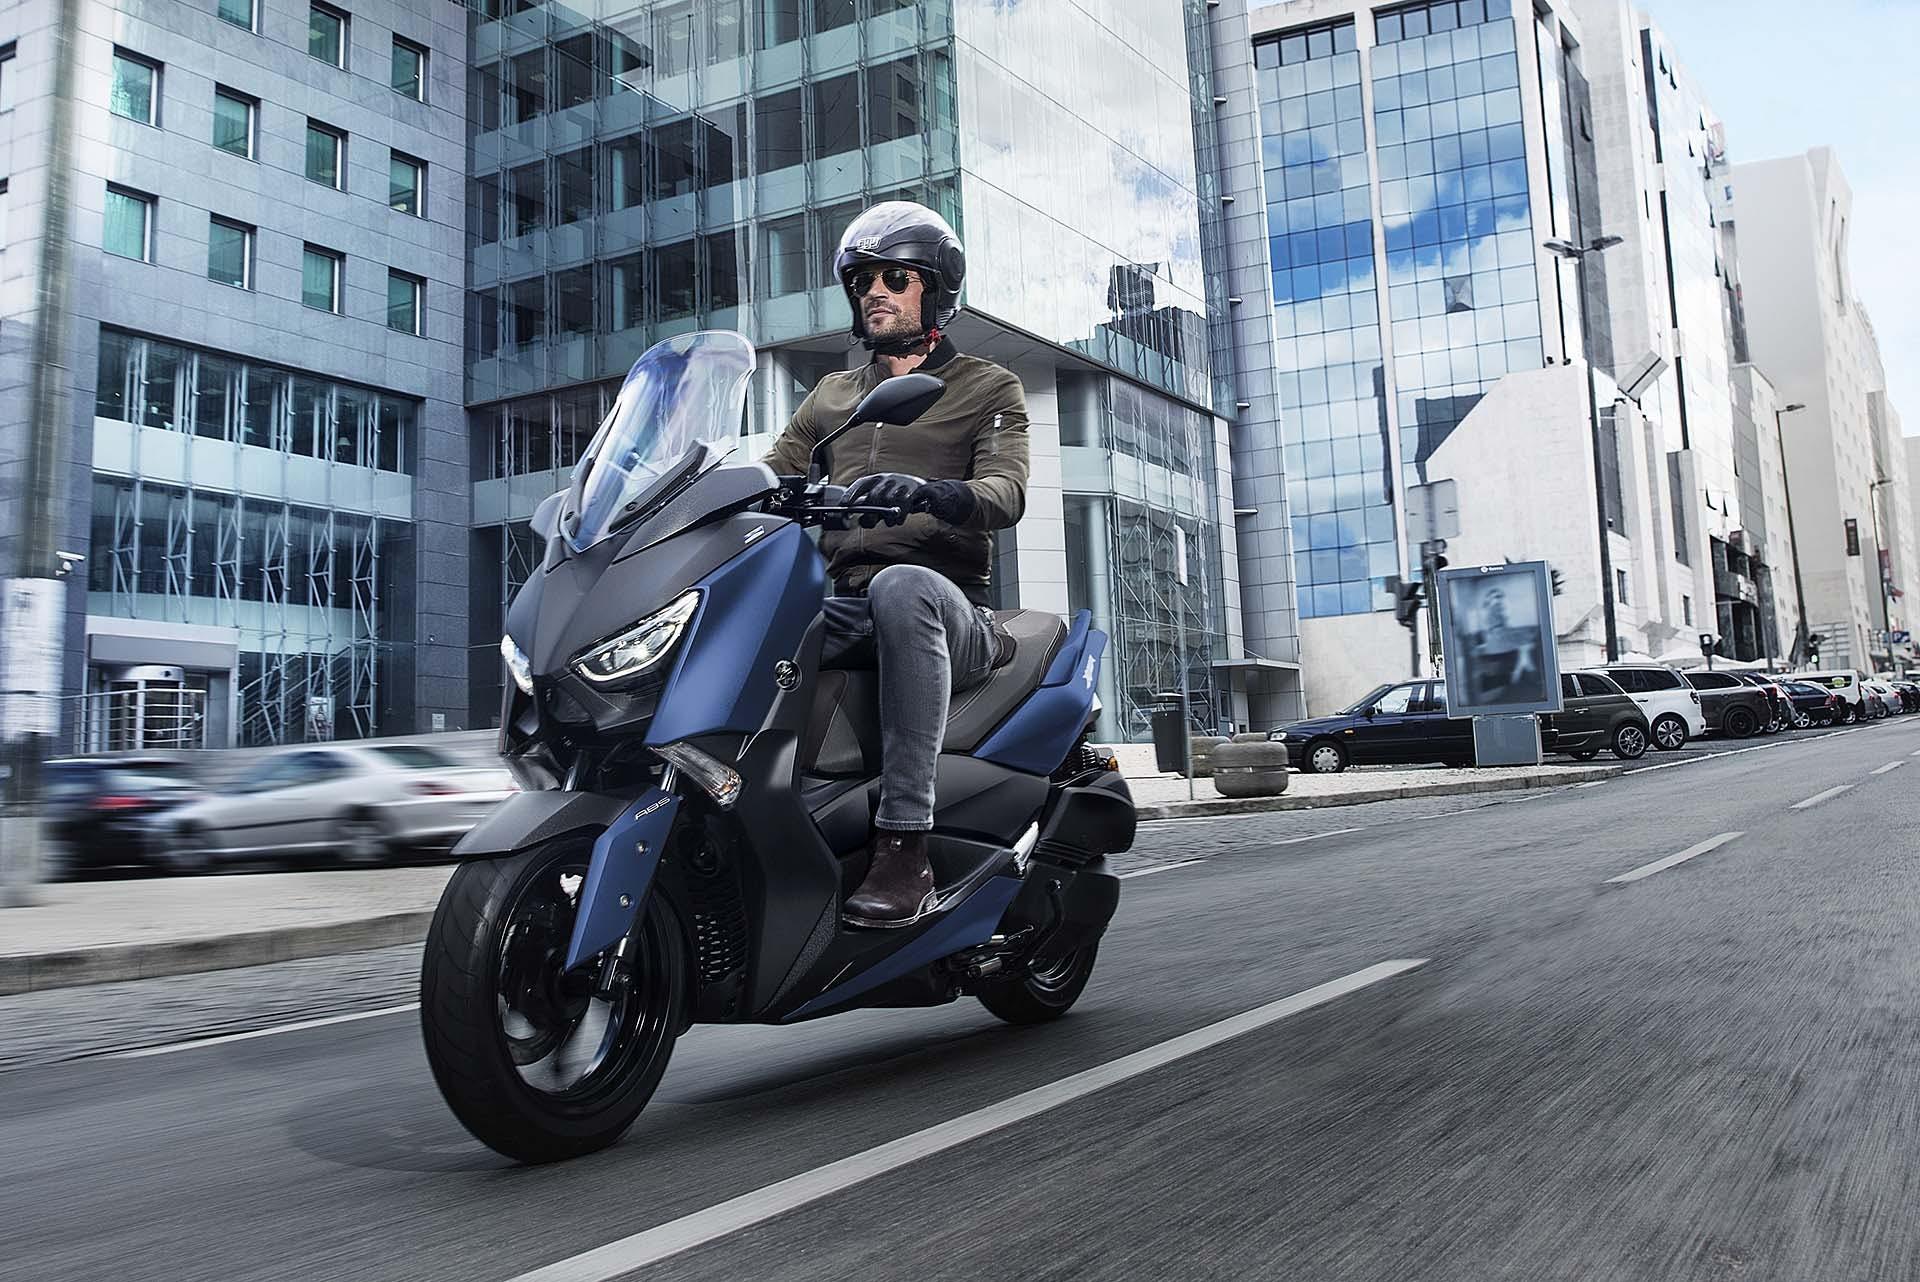 Yamaha XMax 300 migliori scooter 300